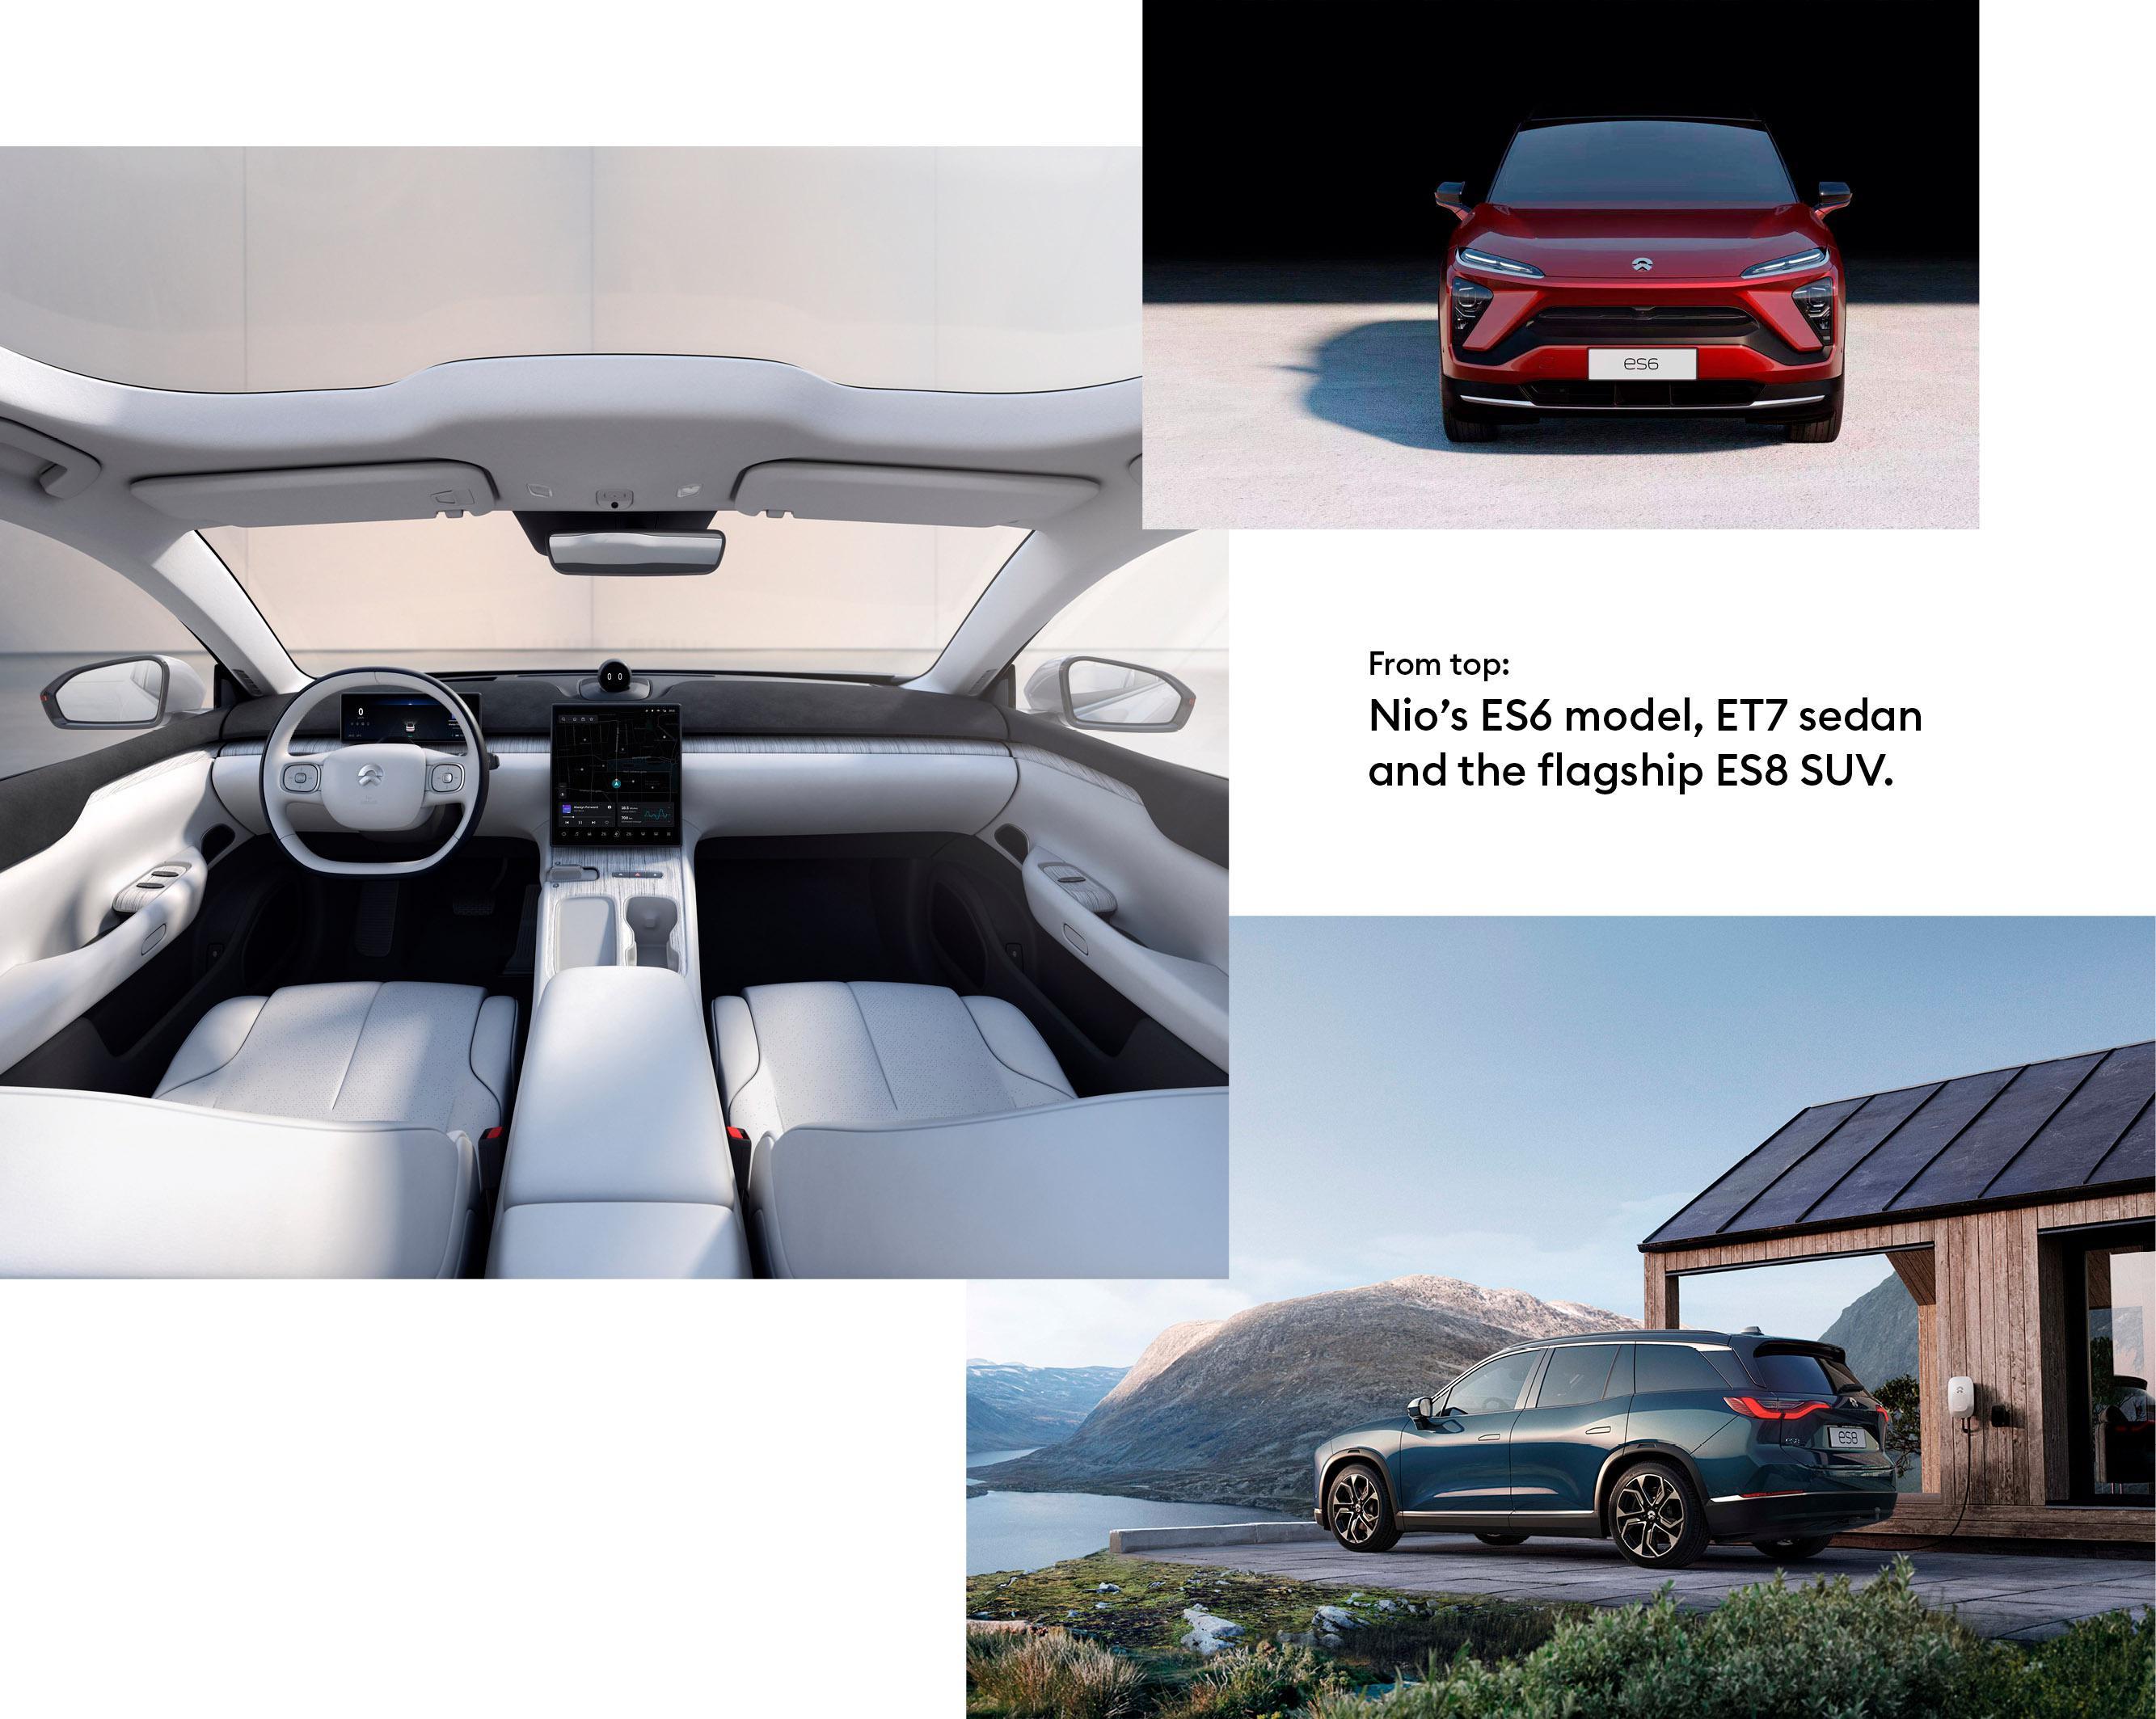 Nio's ES6 model, ET7 sedan and the flagship ES8 SUV.